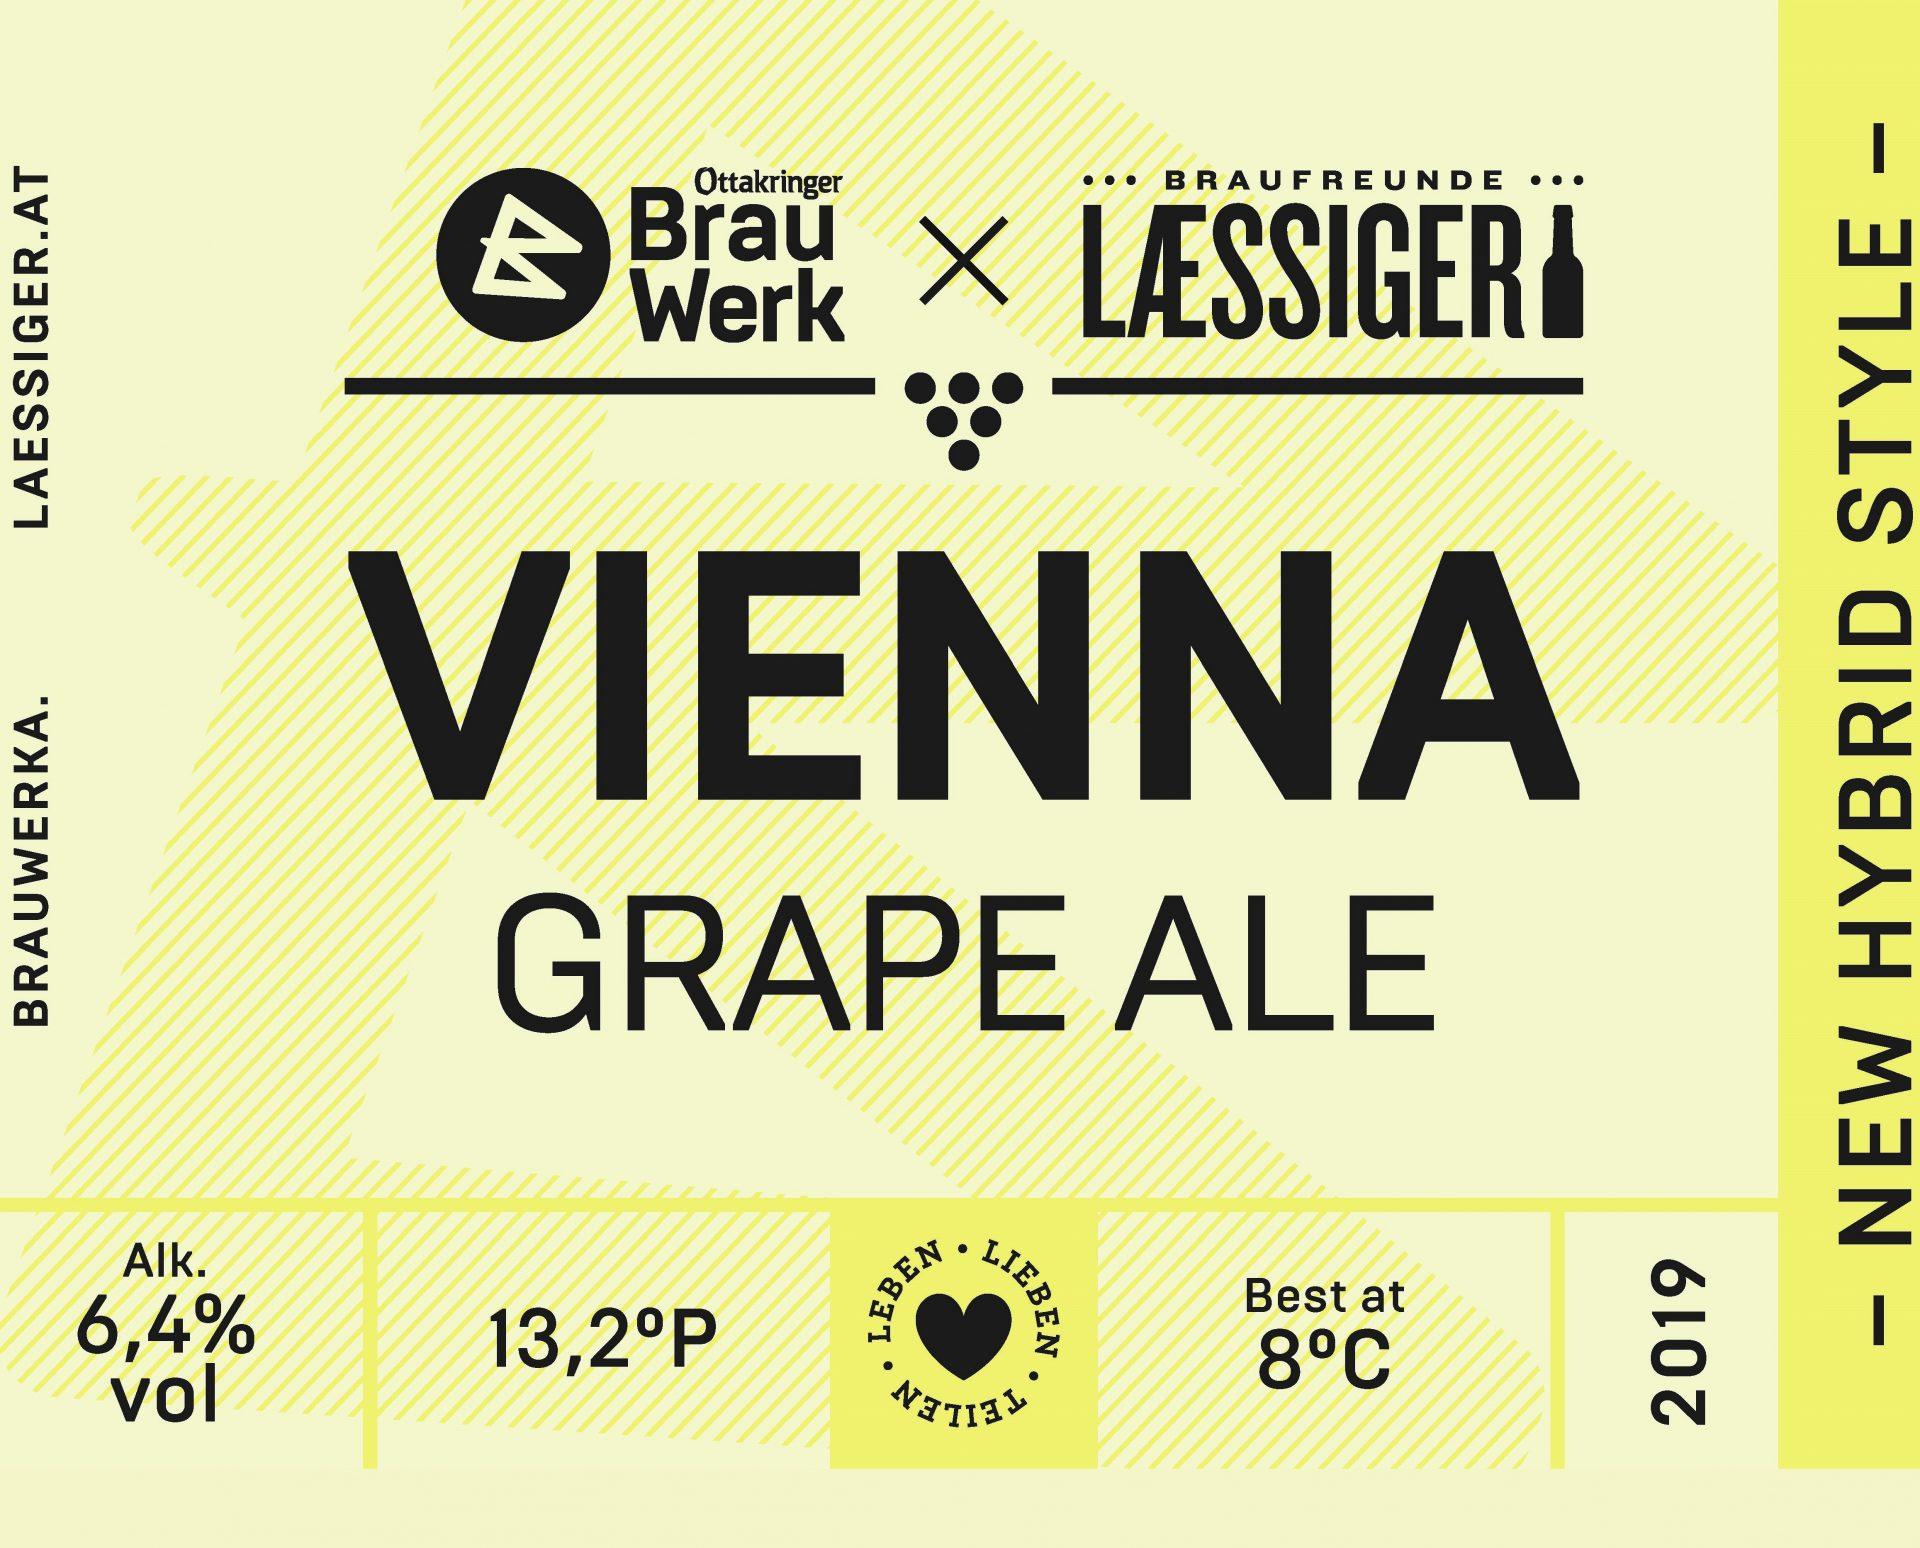 VIENNA GRAPE ALE